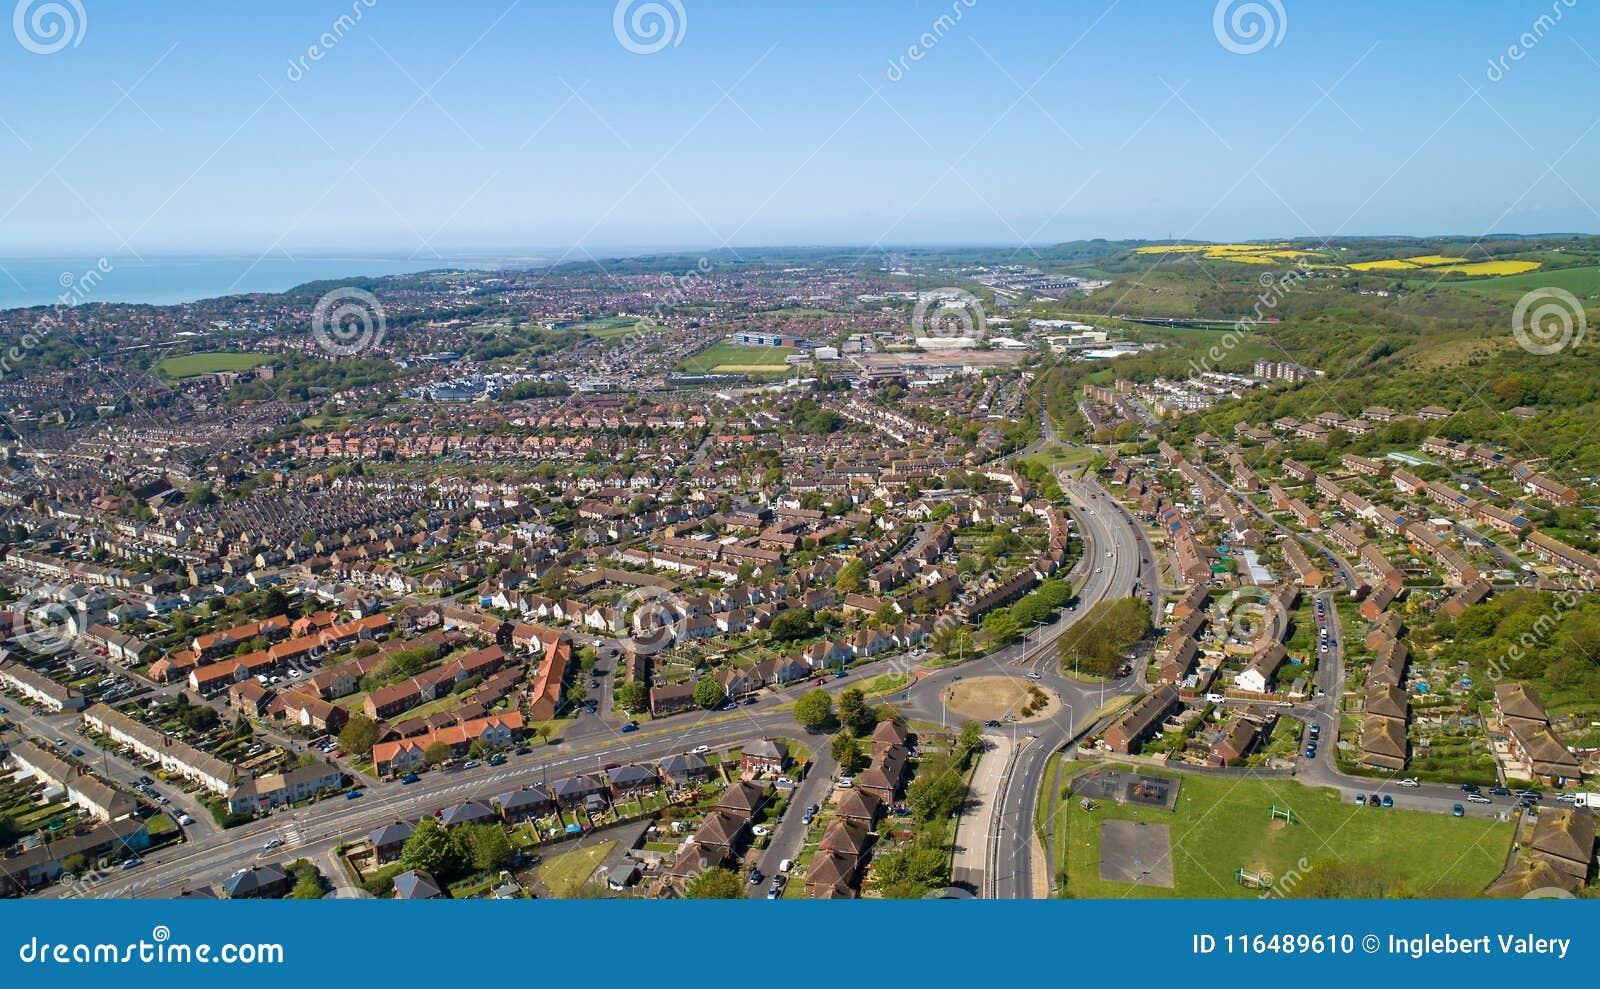 Fotografia aérea da cidade de Folkestone, Kent, Inglaterra